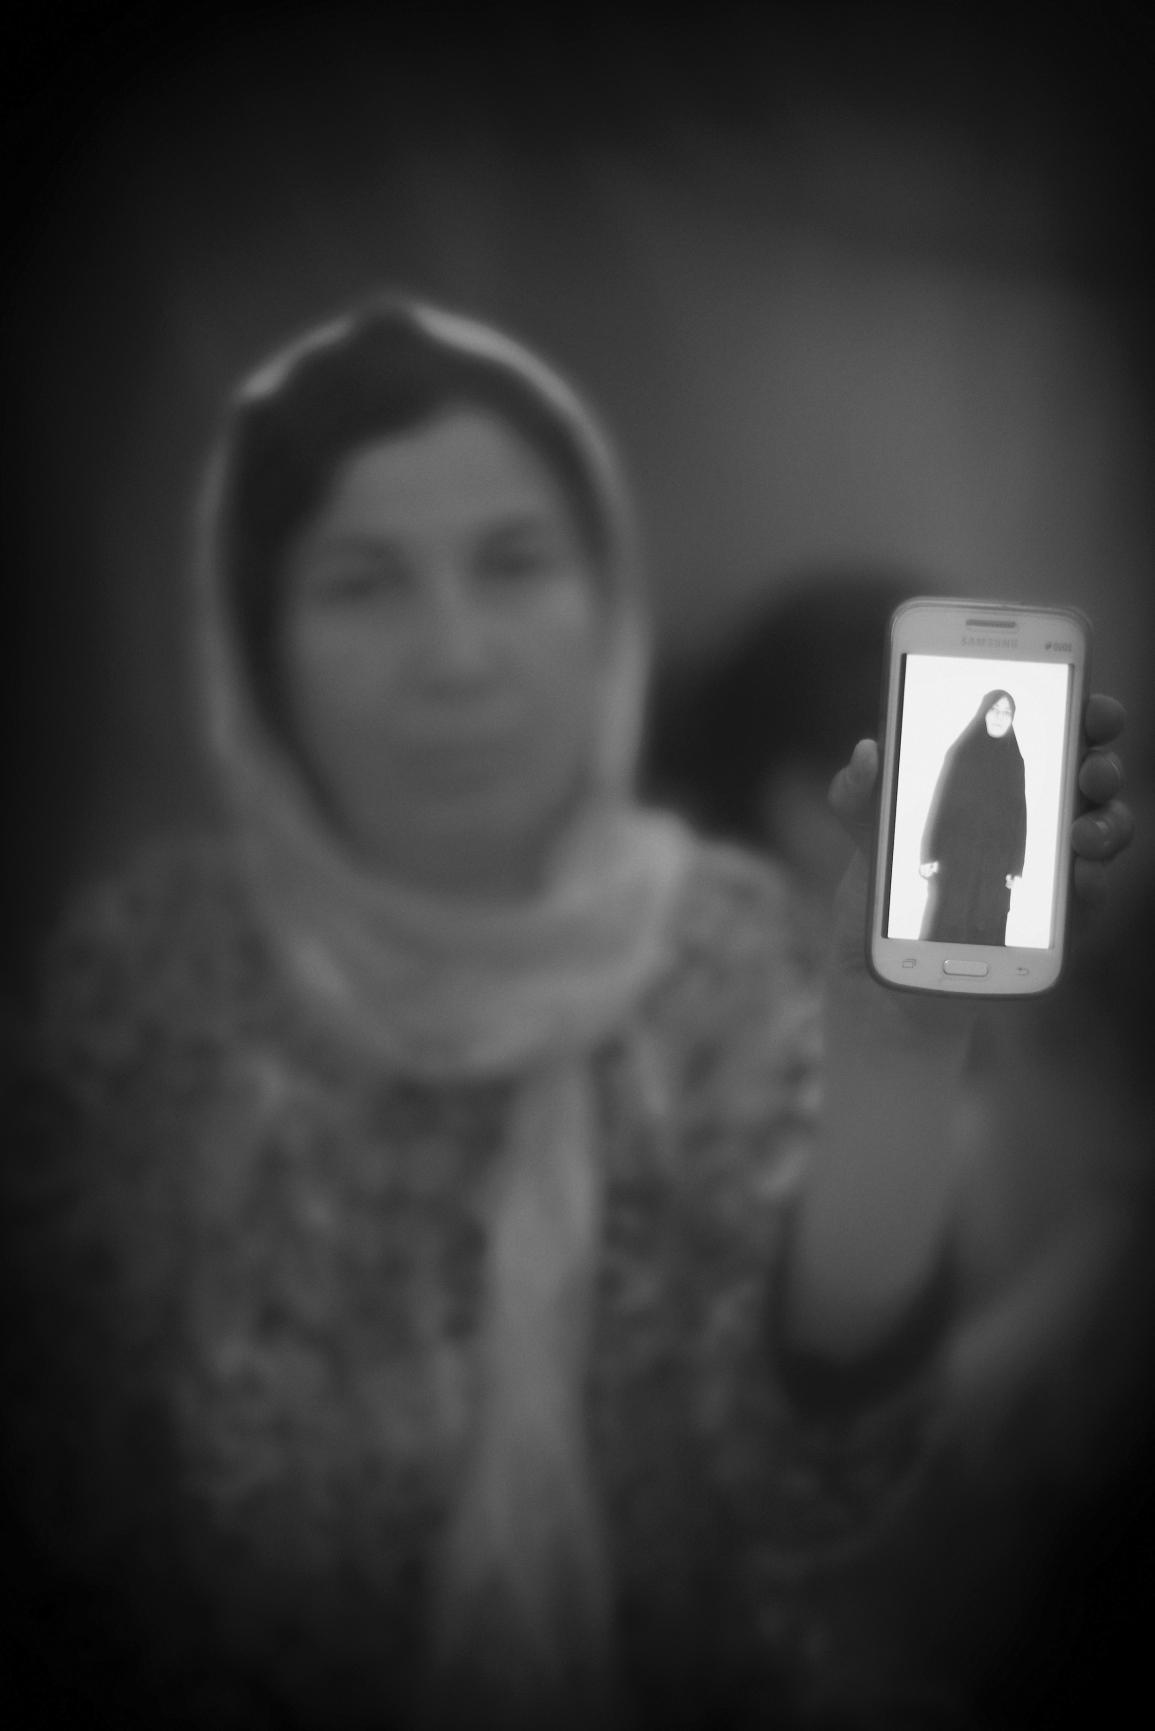 Fotograf bortford av irakisk polis